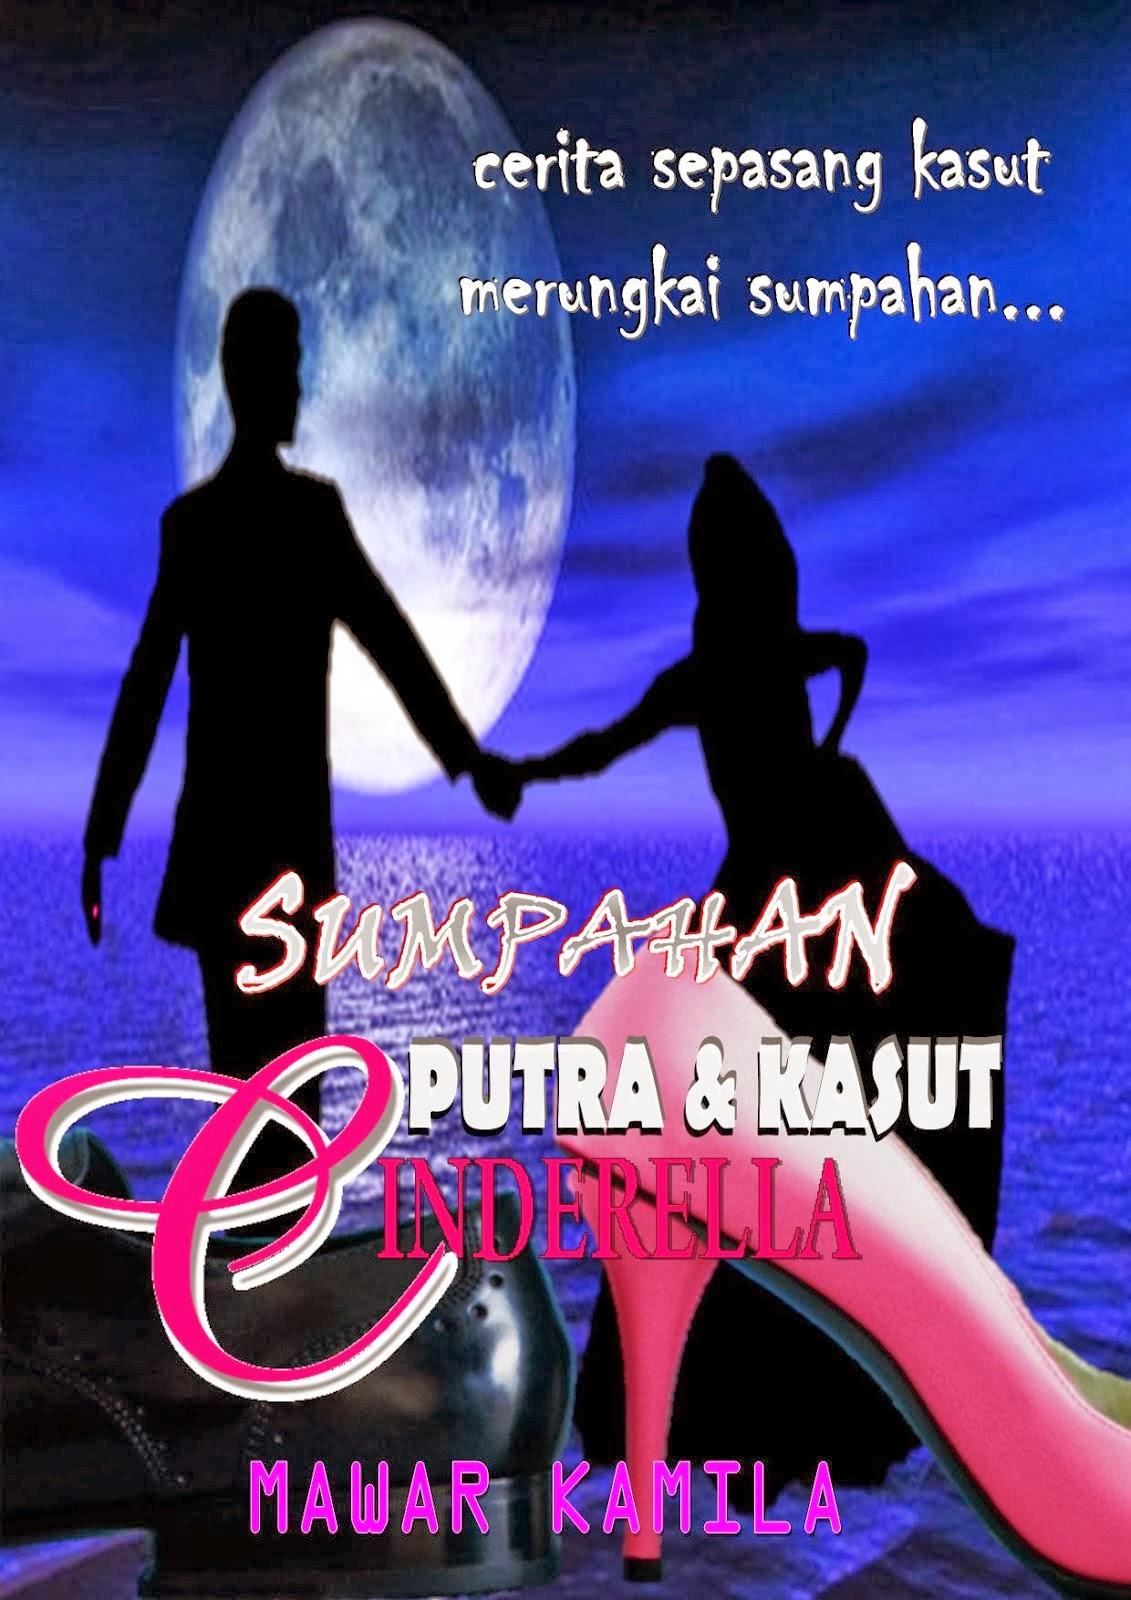 CERPEN: Sumpahan Putra & Kasut Cinderella